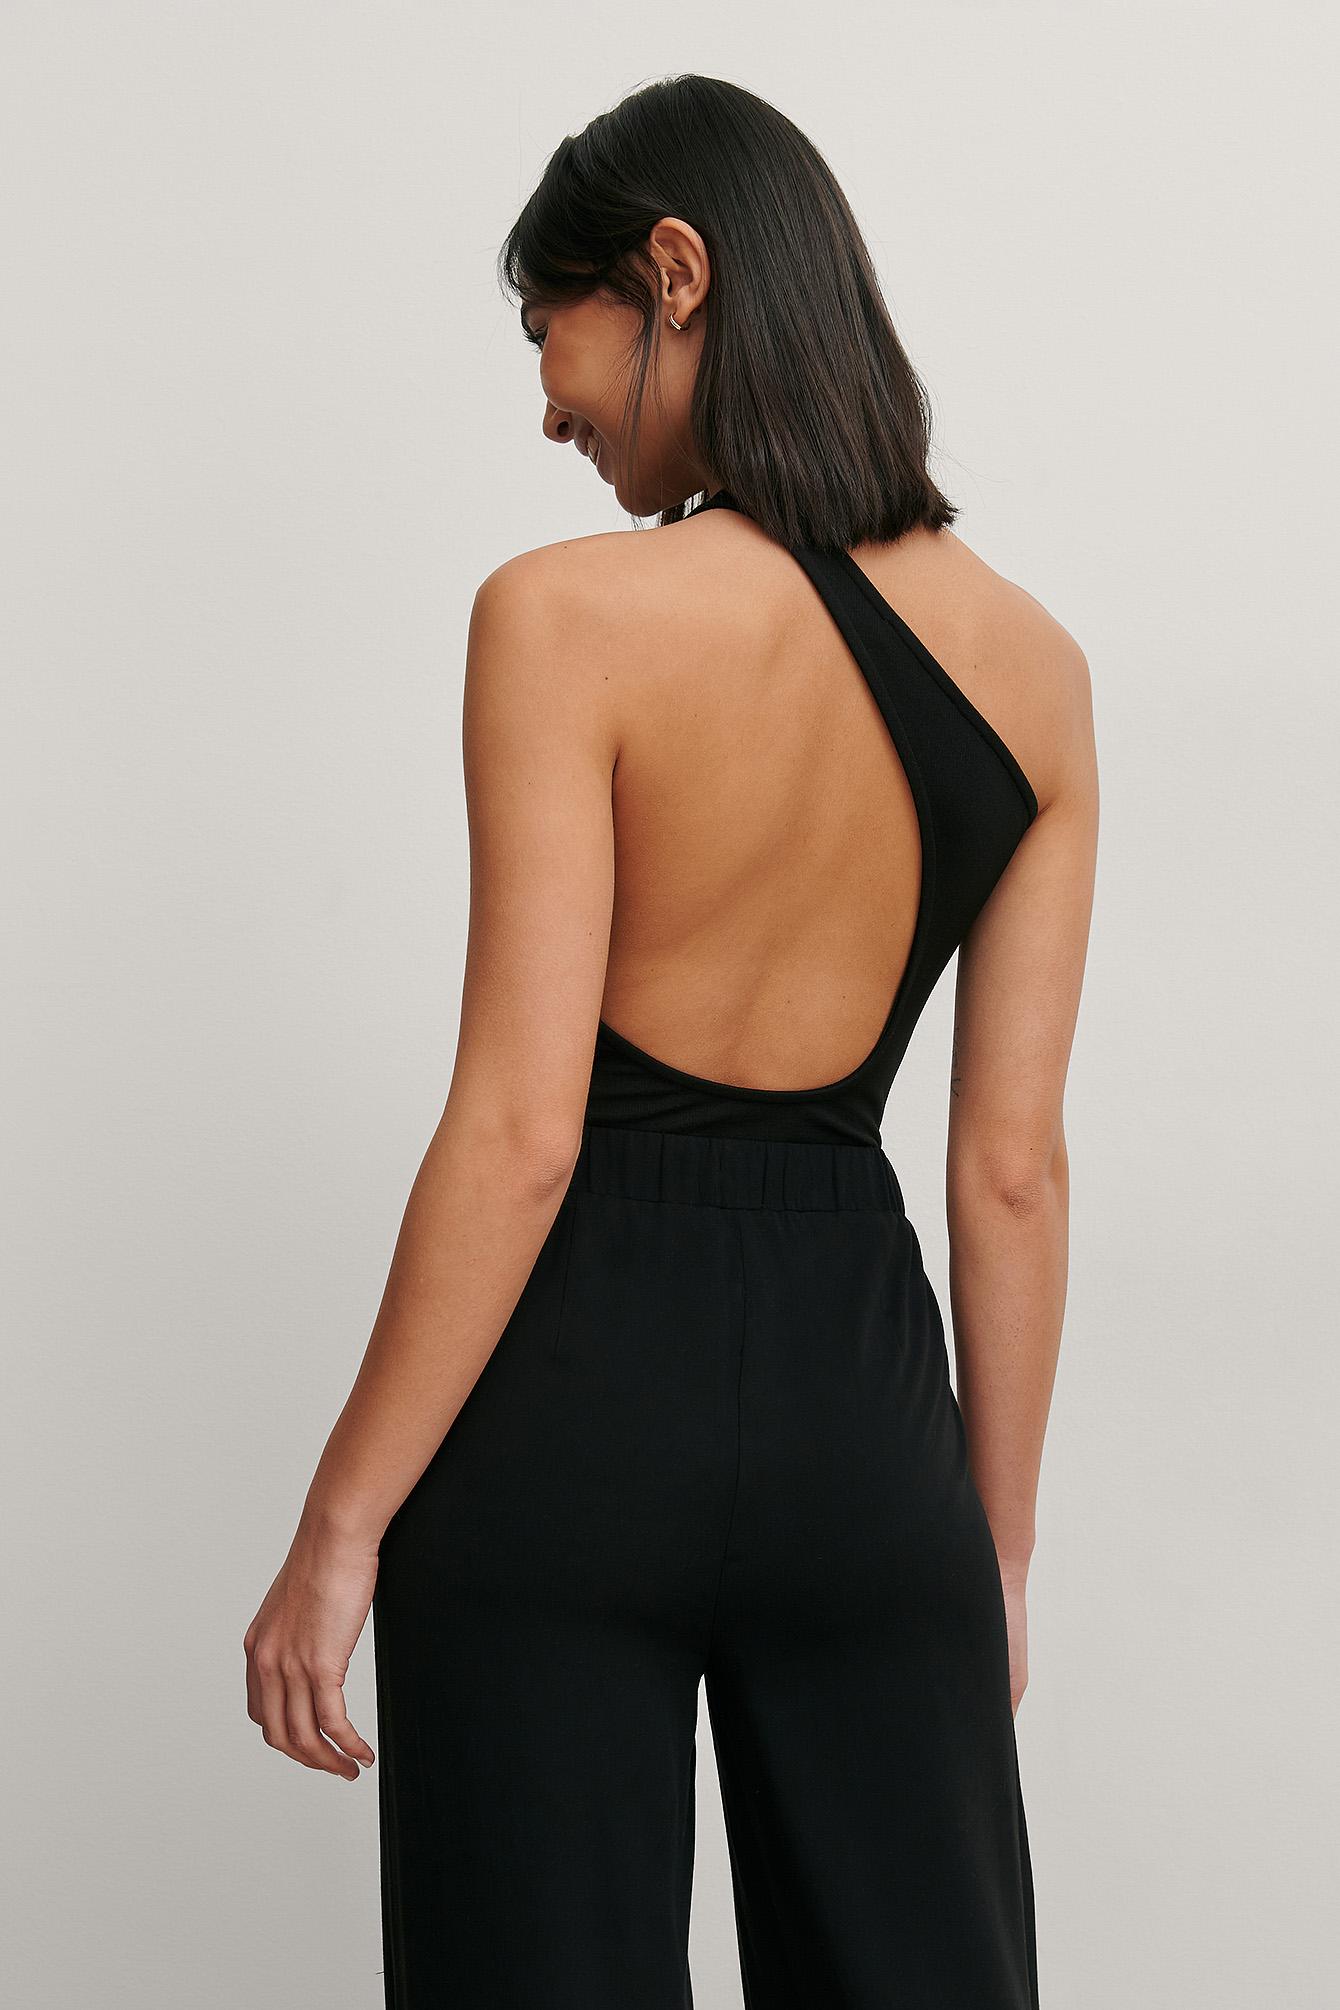 matiamu by sofia x na-kd -  Einseitig Schulterfreies Body Mit Offenem Rücken - Black